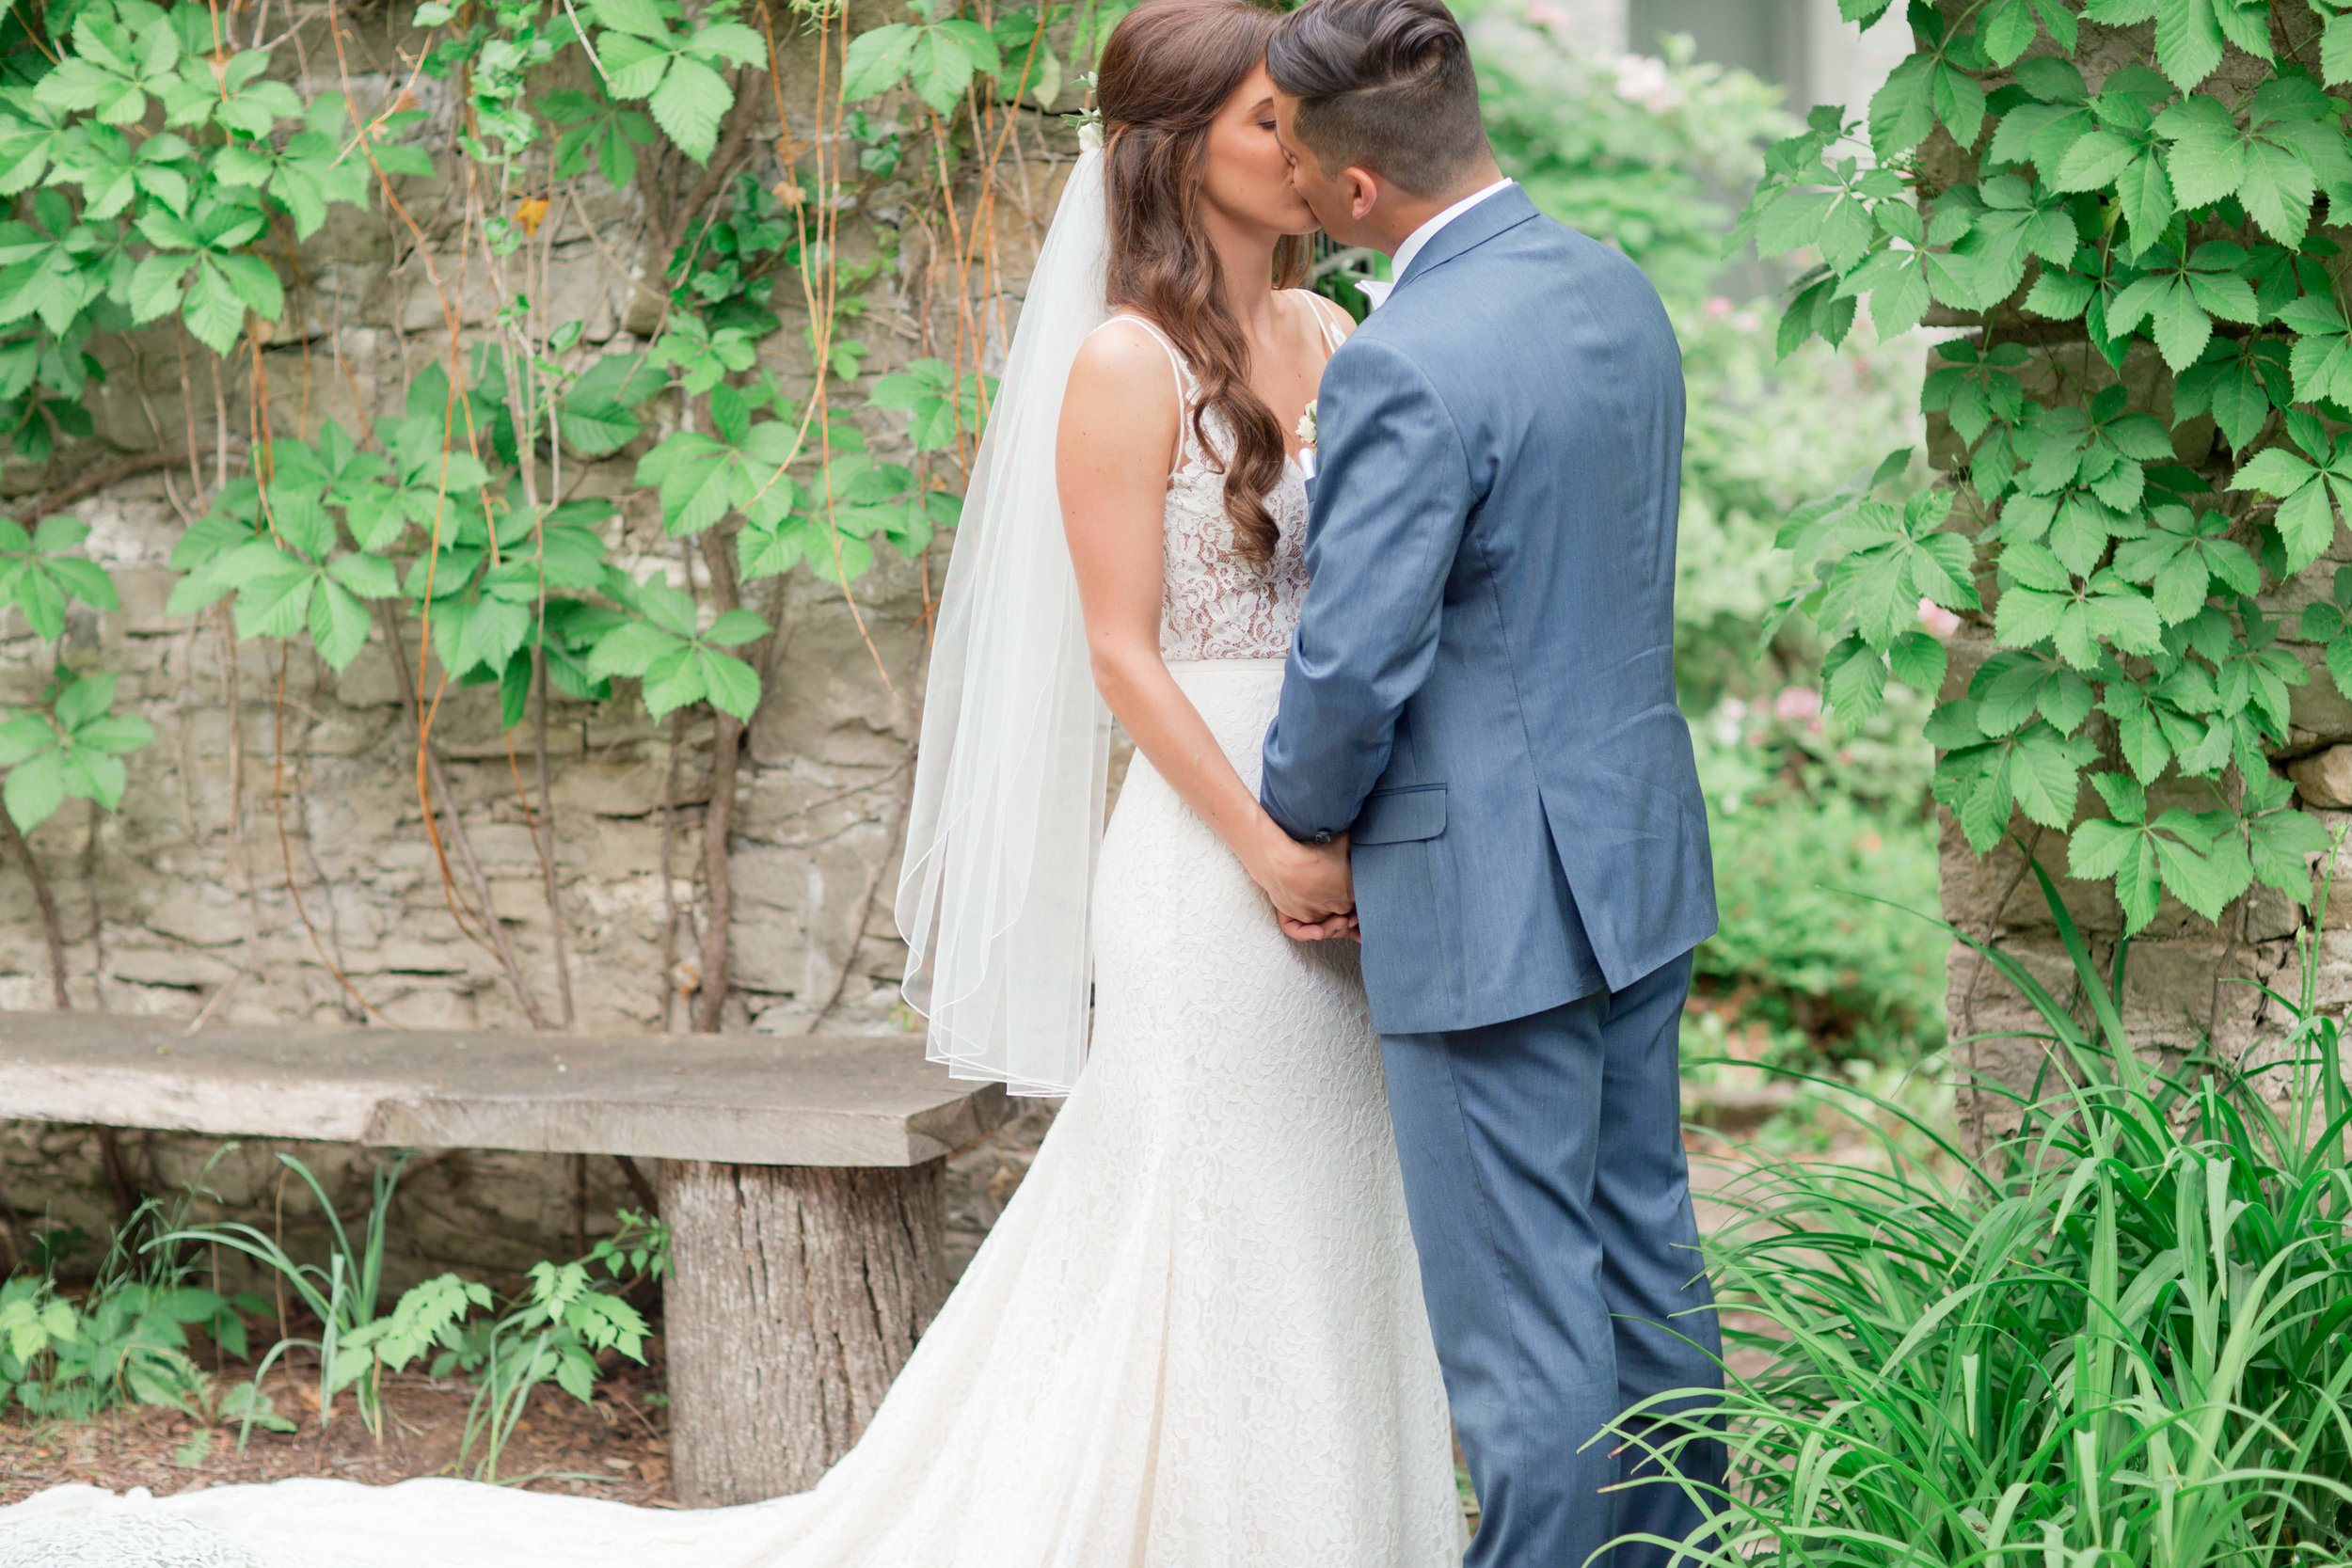 Miranda___Daniel___Daniel_Ricci_Weddings___High_Res._Finals_137.jpg